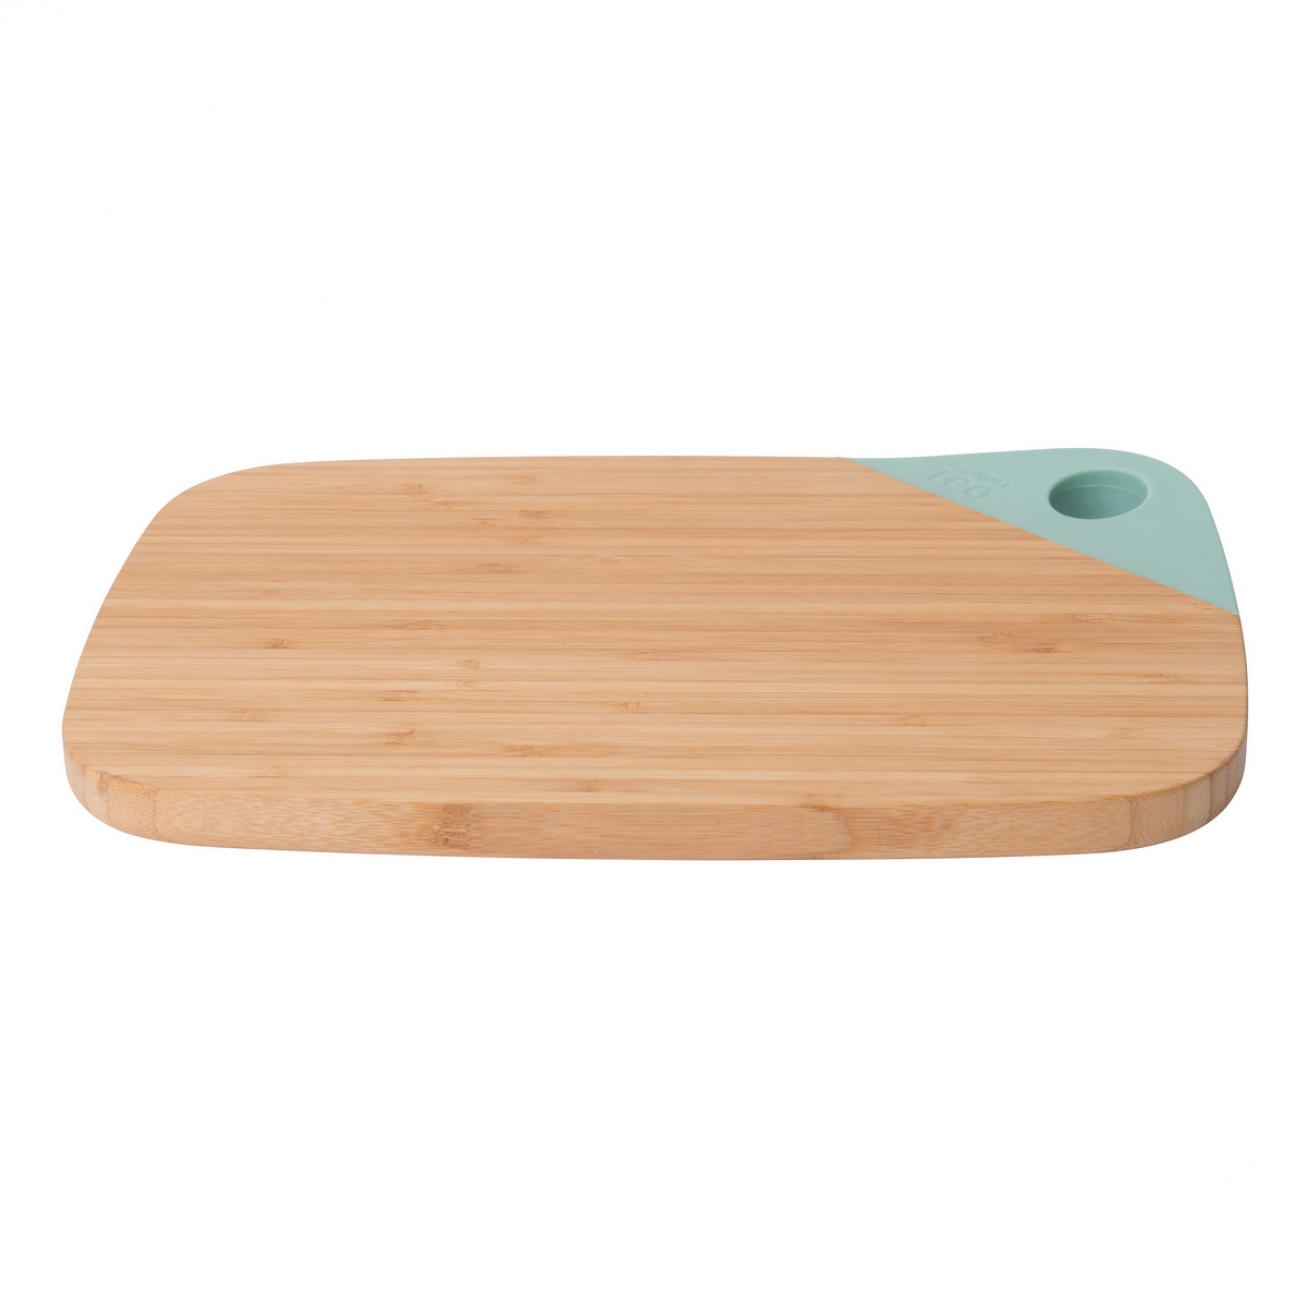 Bamboo cutting board 28 x 20 cm.